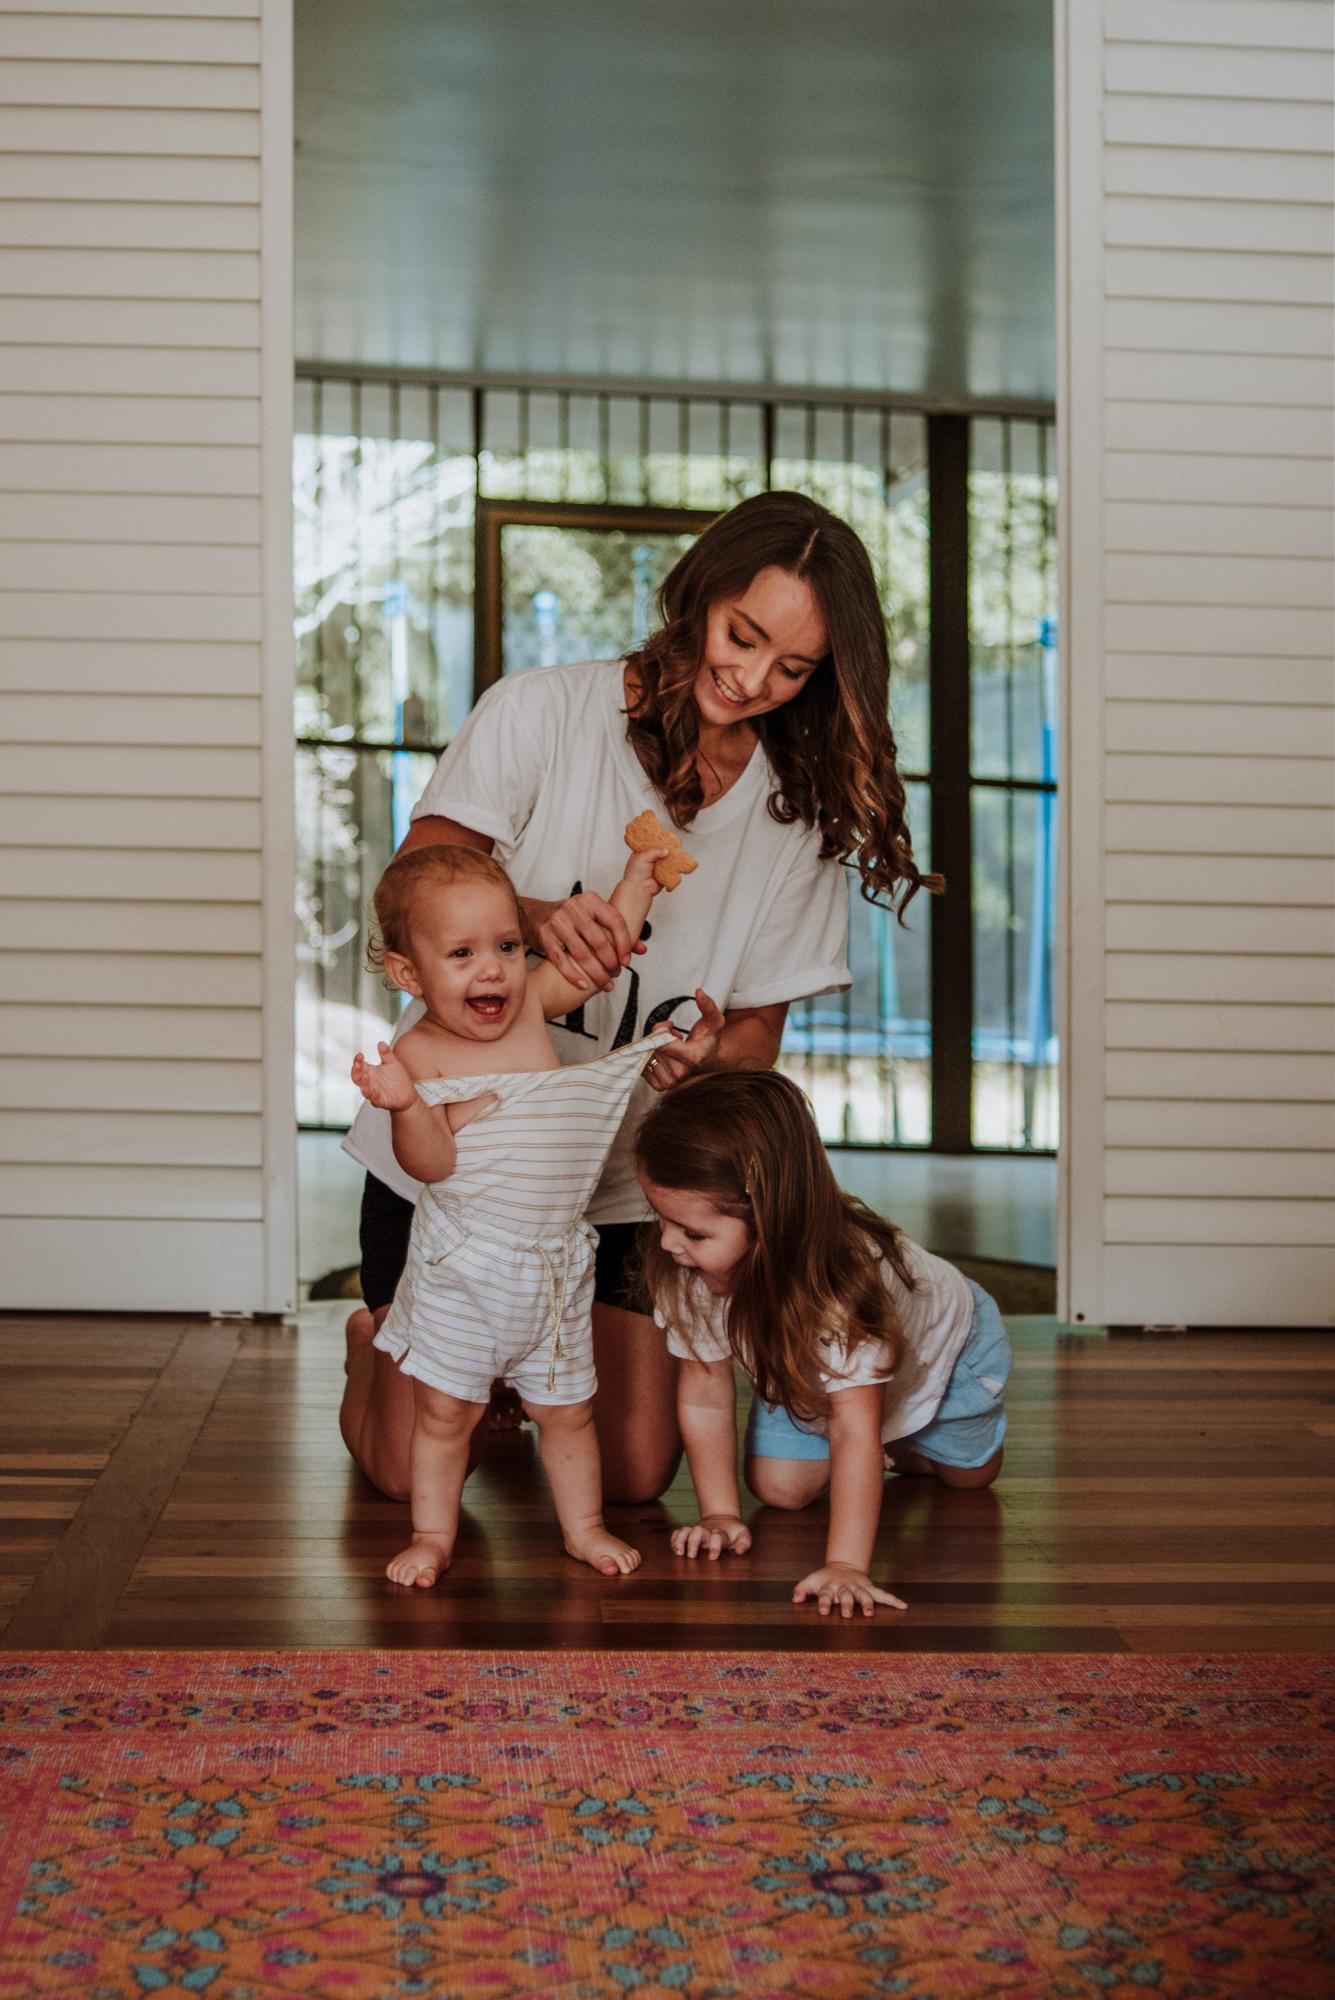 jessica-howard-photography-martins-family-web-3.jpg